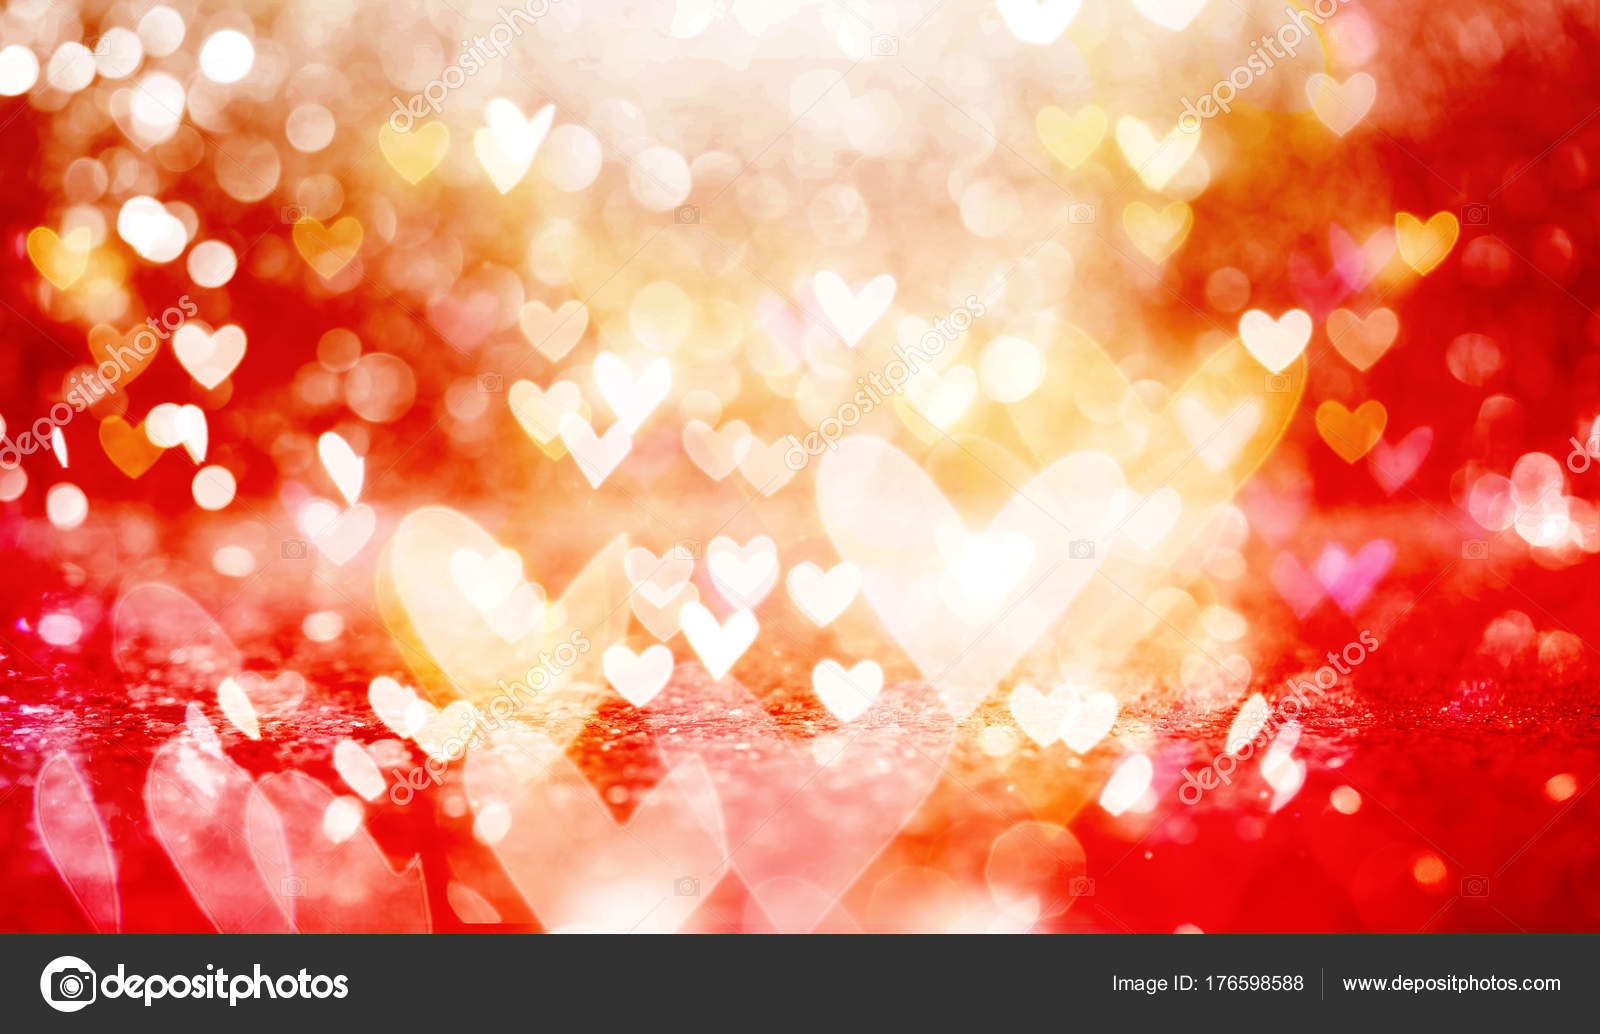 Картинки с сердечками Красивые: Картинки Блестящие Сердечки